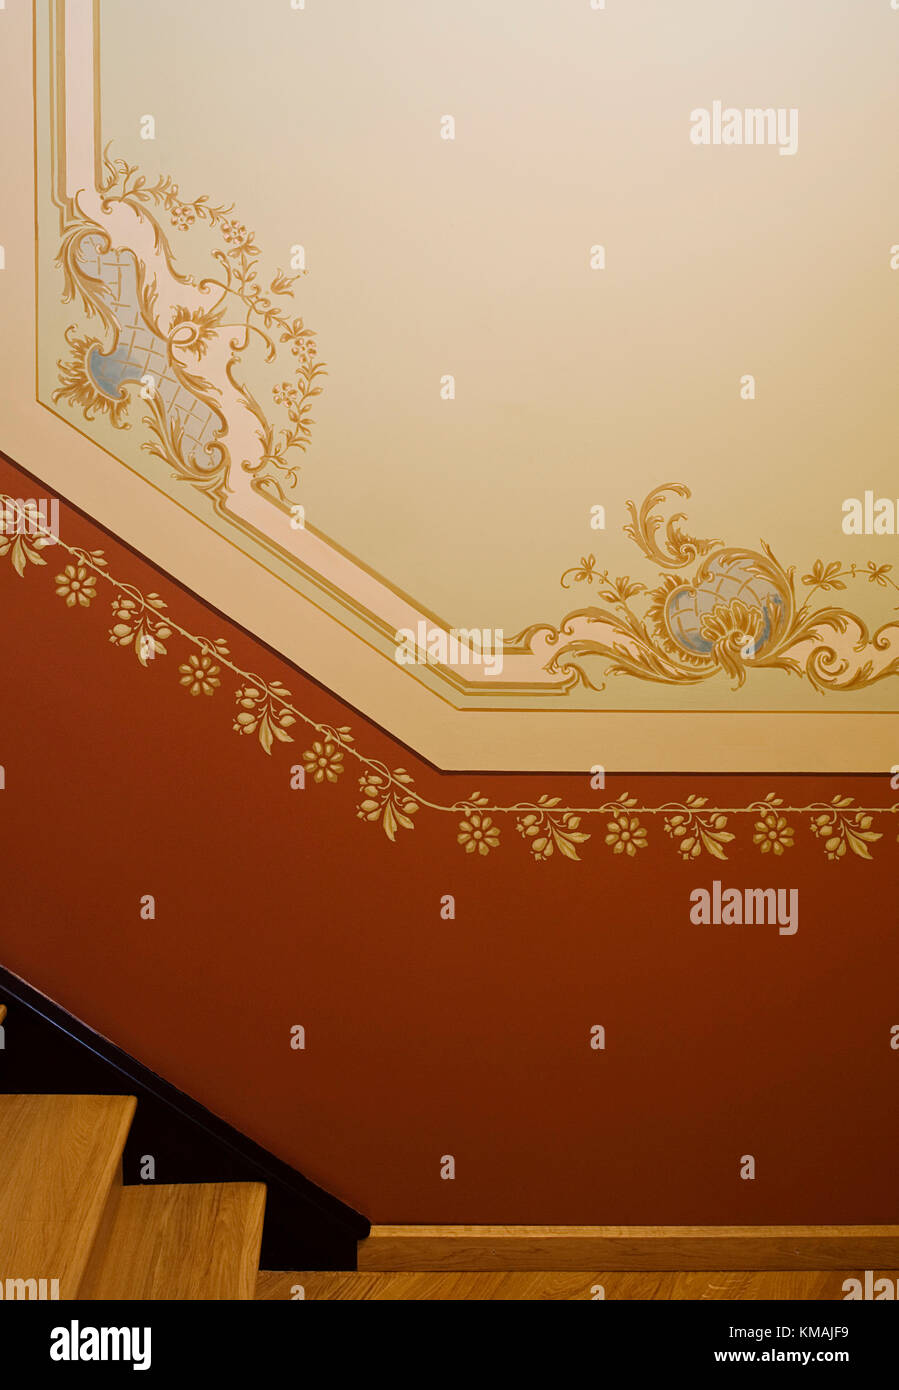 Wand, Dekoration, Gemälde, historisch, innen, Haus, tradición, Oldenburg, firme, Treppe Leuchte, Ornamento Imagen De Stock